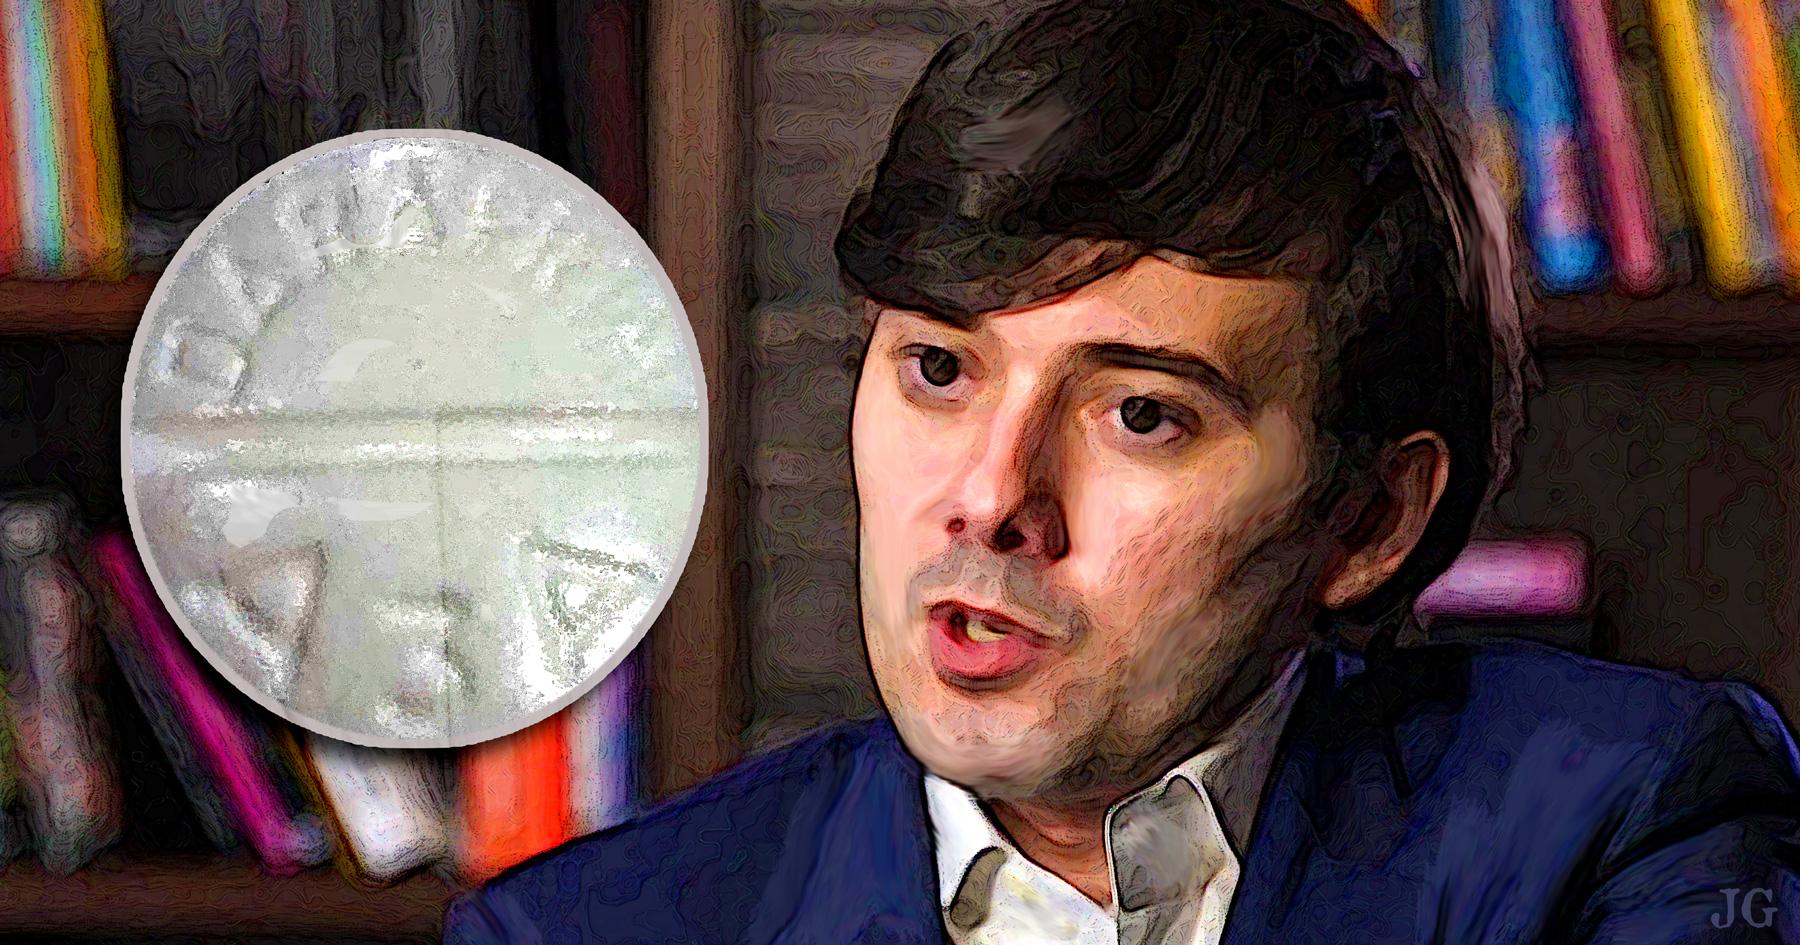 Martin Shkreli, Turing Pharmaceuticals, Daraprim, greed, FDA, ilustration, Common Sense